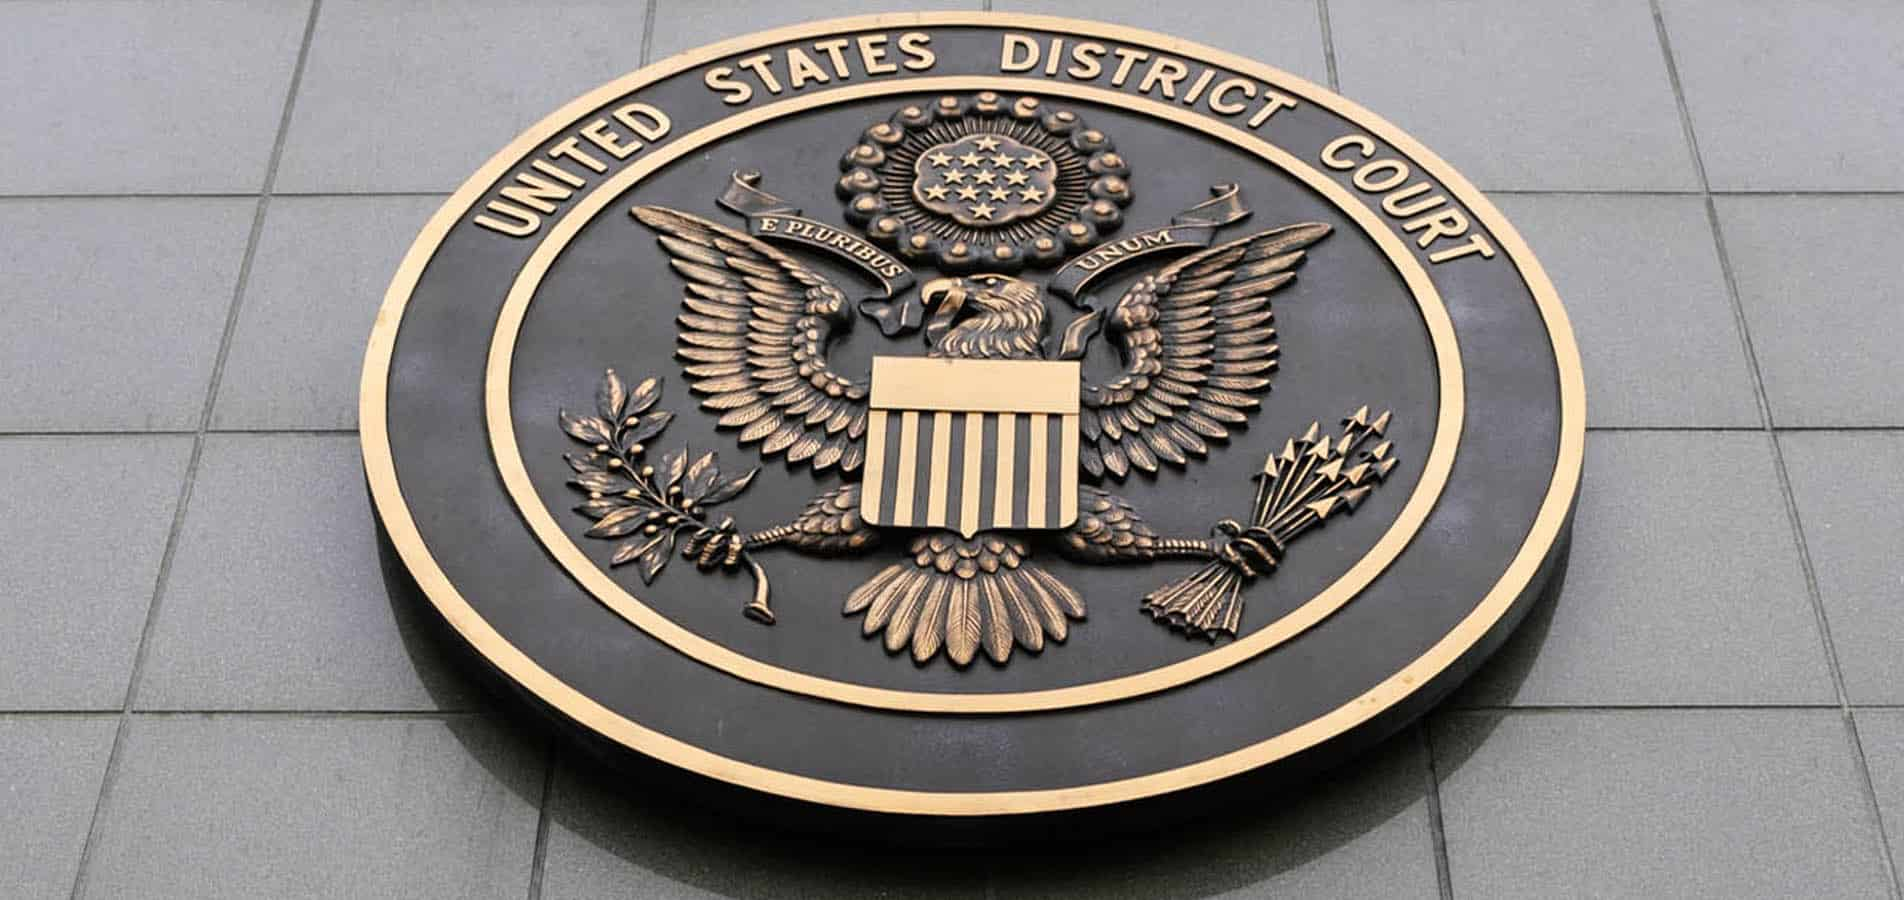 USDC Seal